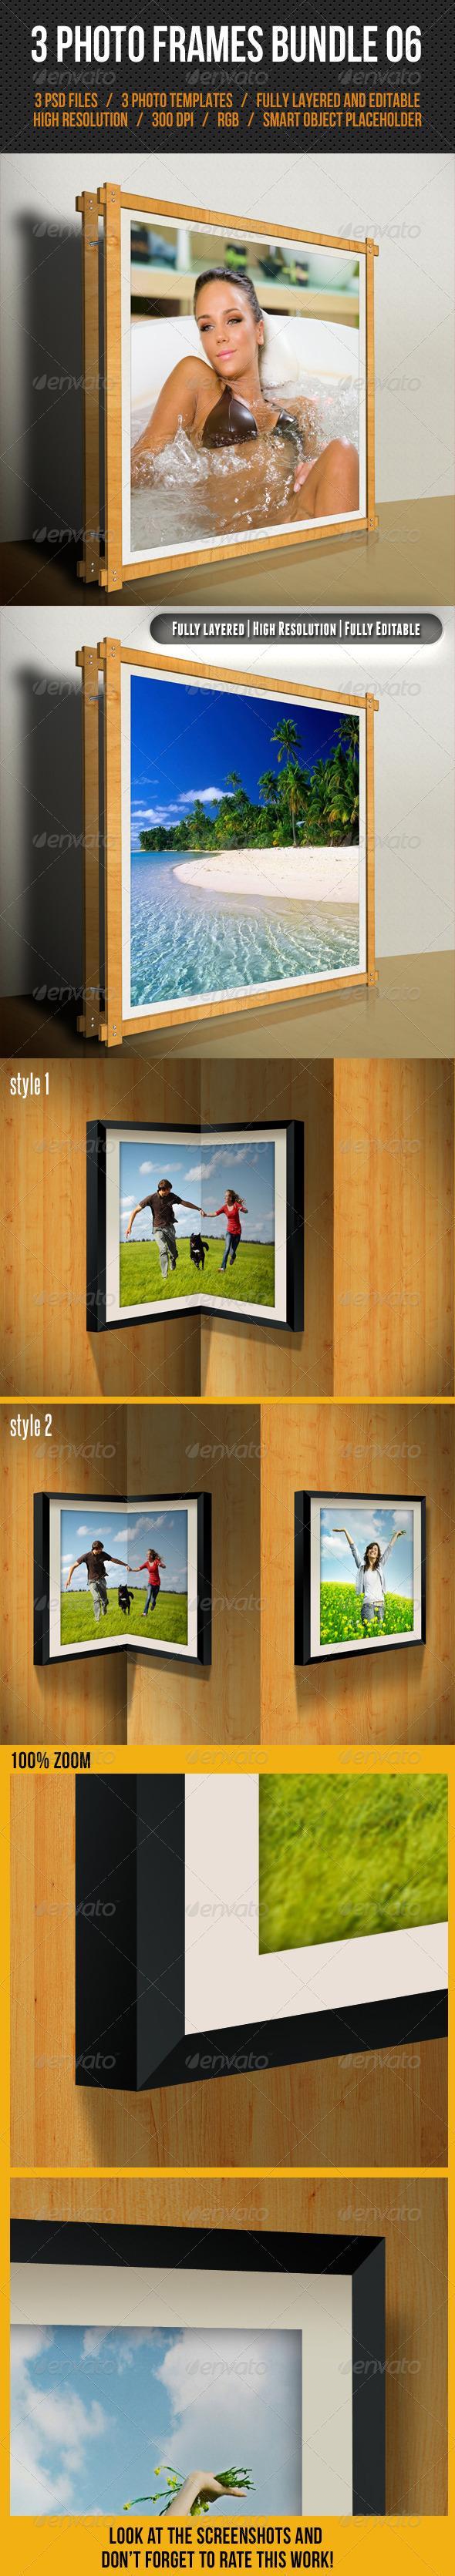 GraphicRiver 3 Photo Frames Bundle 06 7750729